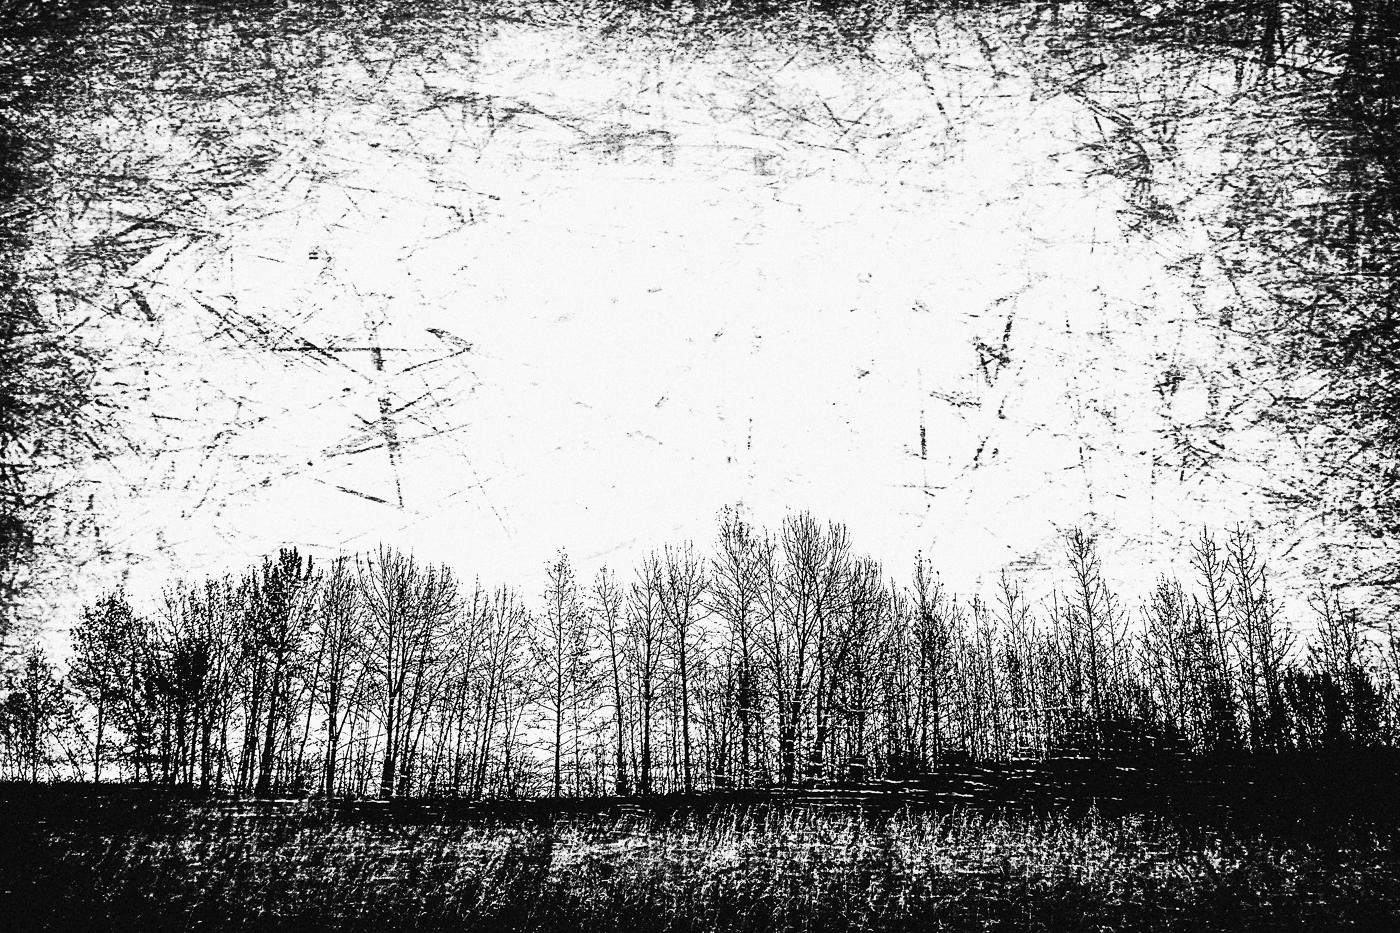 hb images - woods b-w - 6